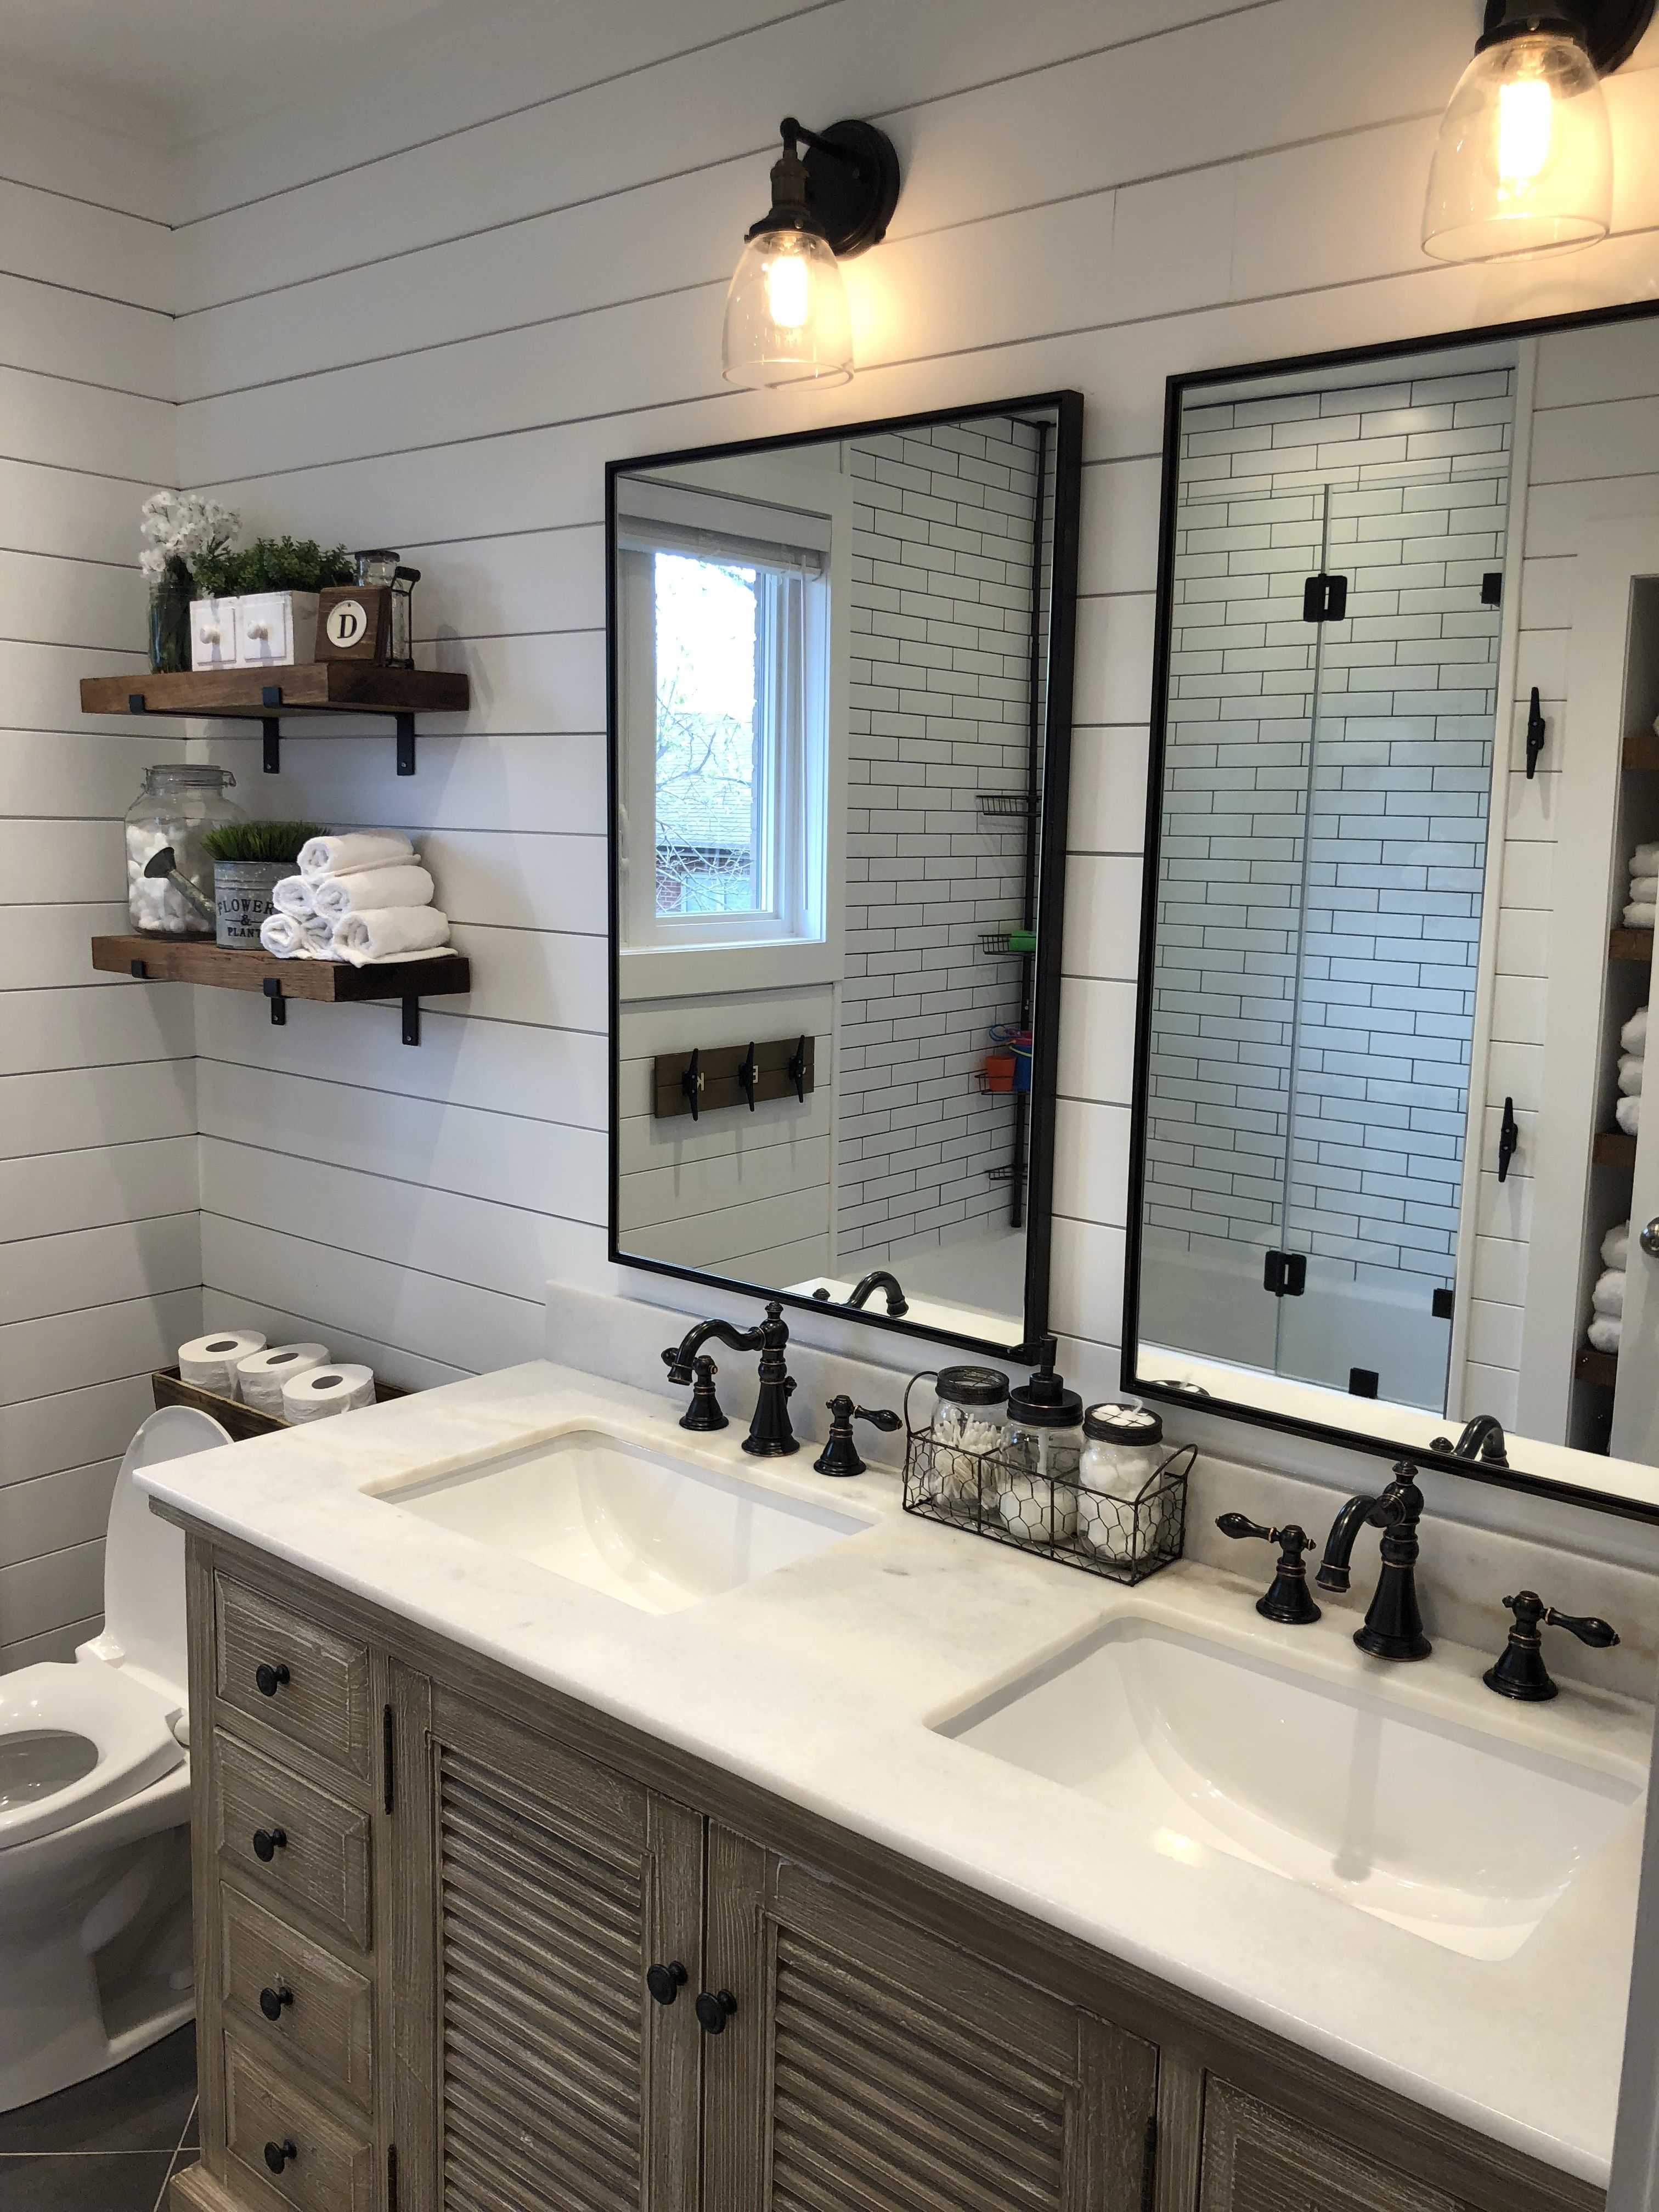 Modern Farmhouse Bathroom With Wood Vanity Shiplap Walls Oil